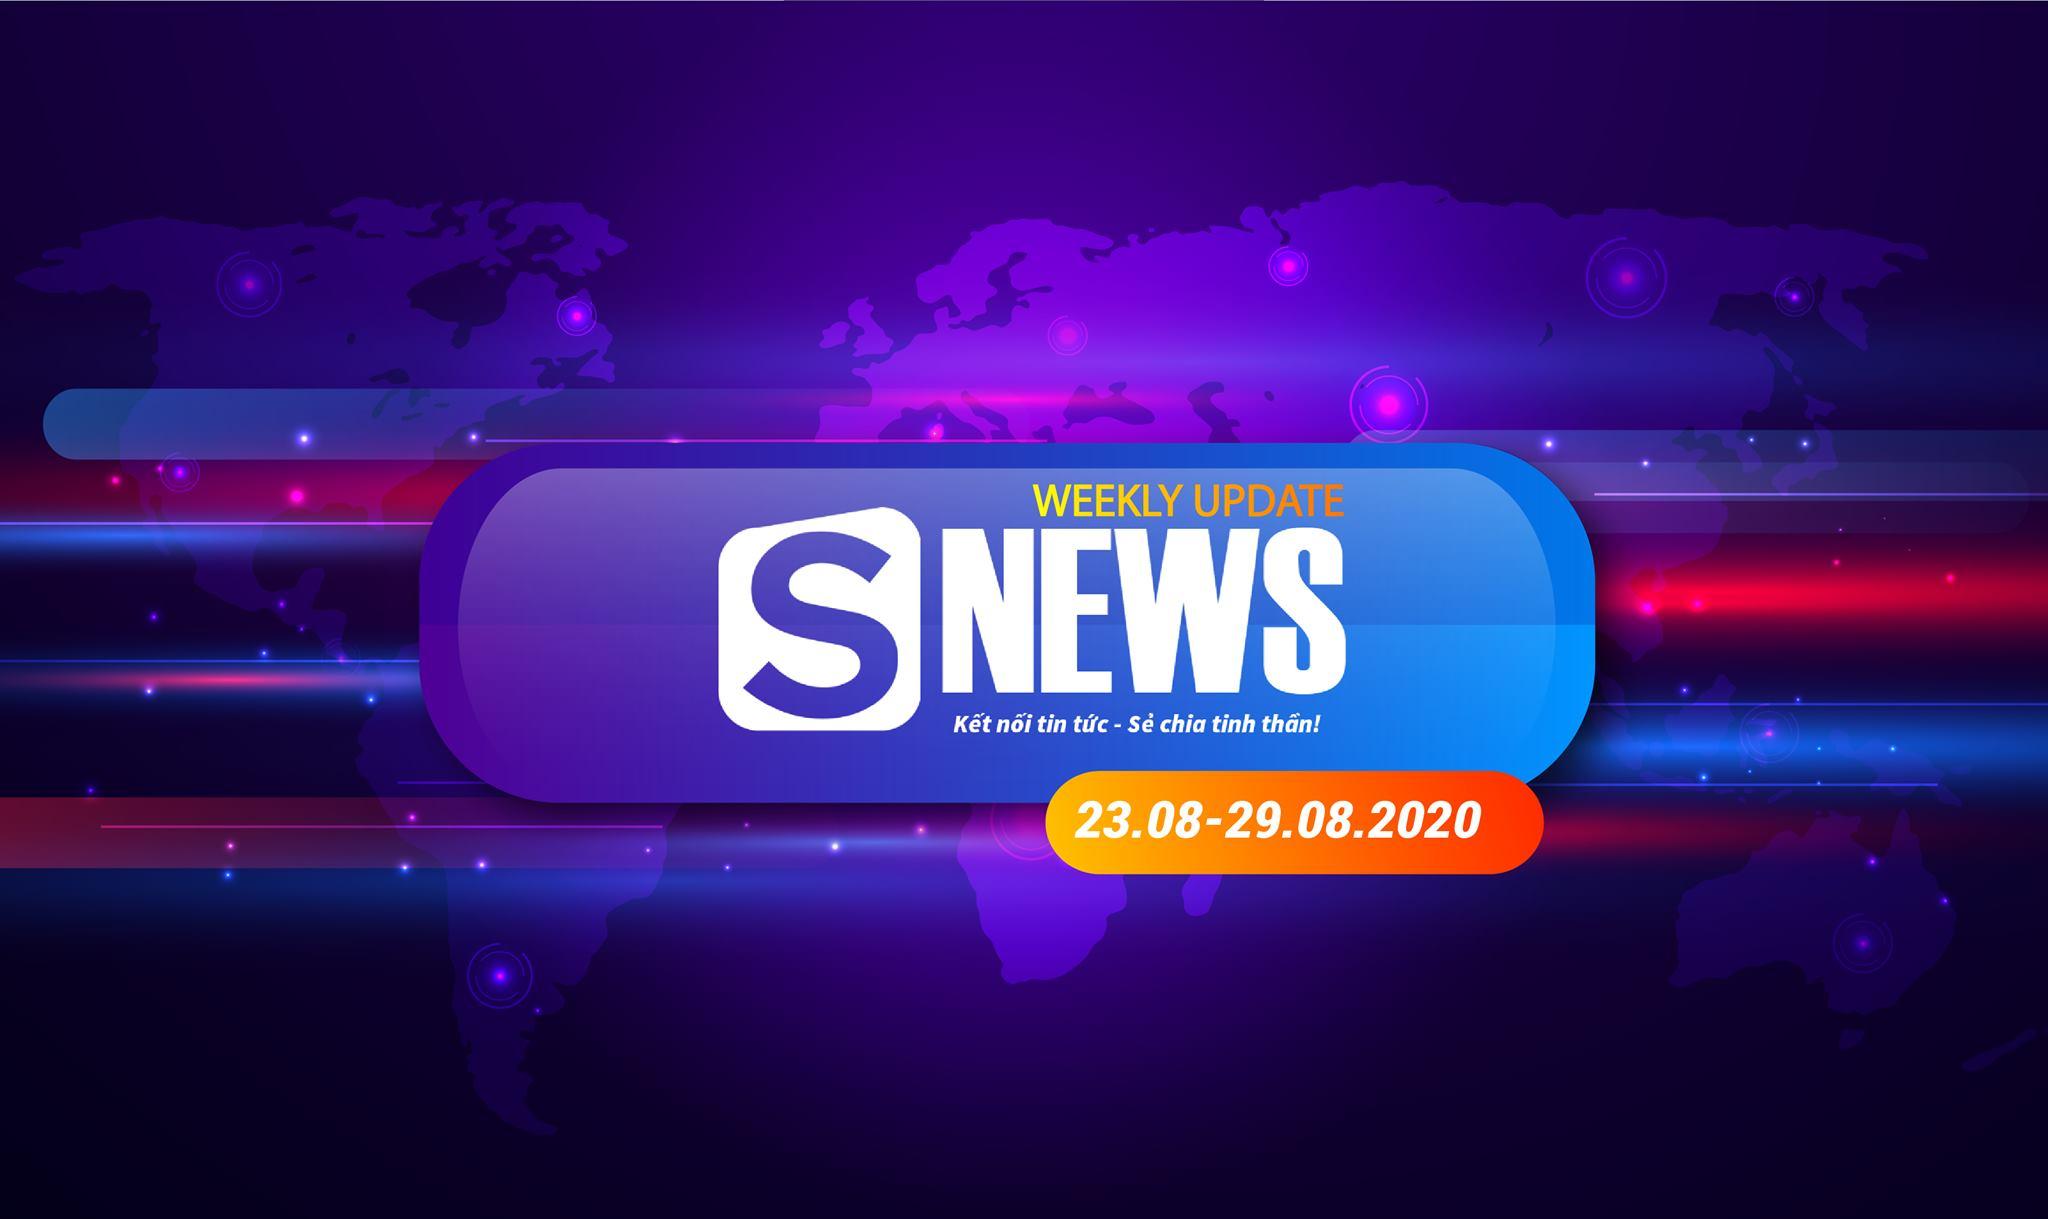 Tổng hợp tin tức Sapo tuần qua: 23.08 - 29.08